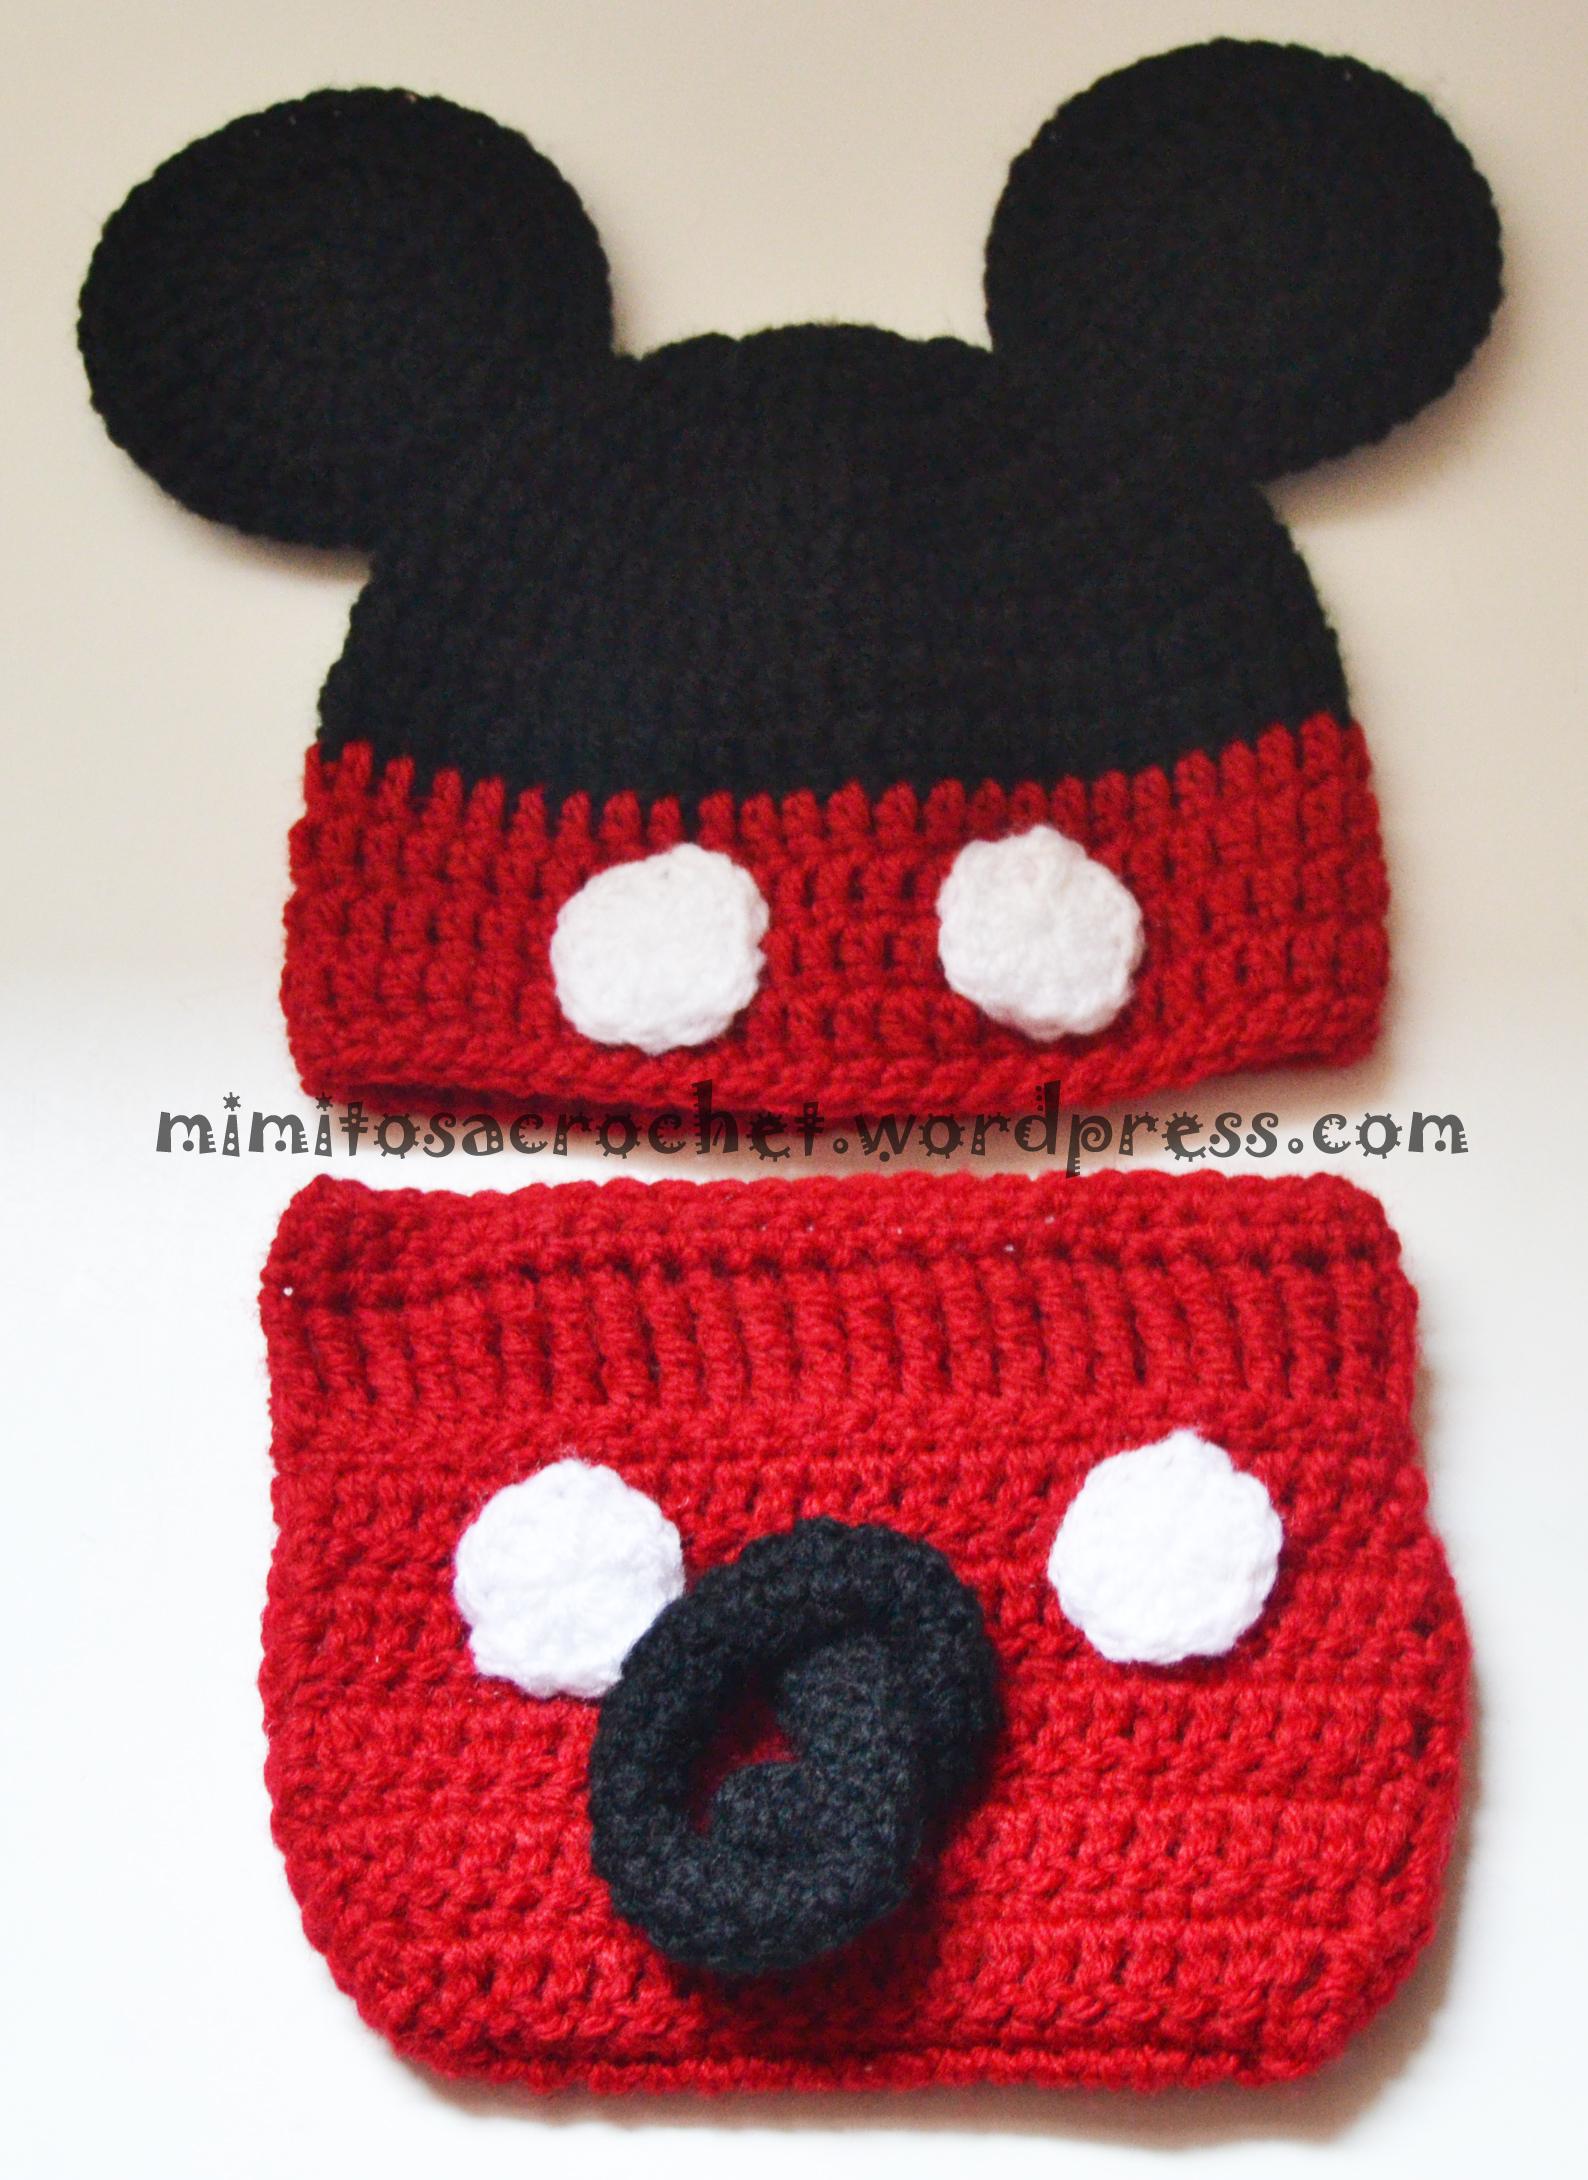 Cubrepañales a crochet – Mimitos a Crochet